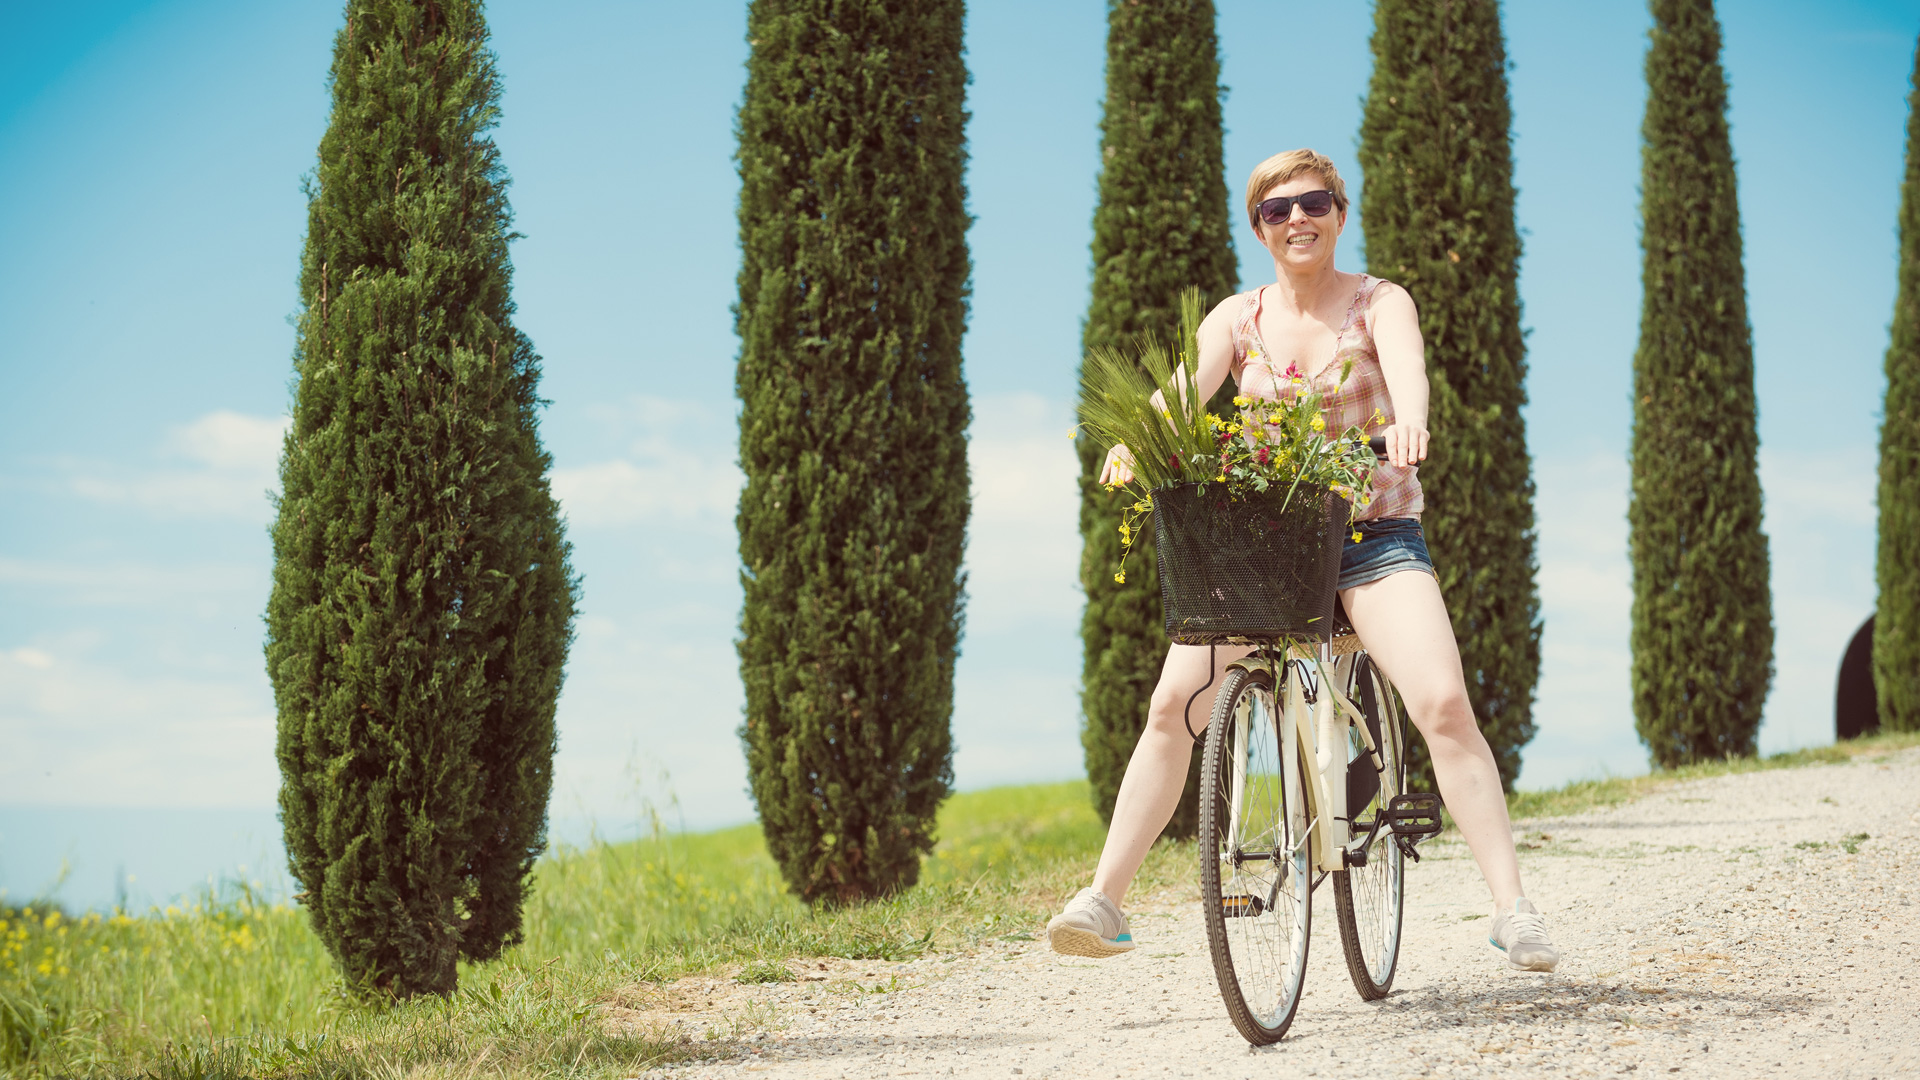 Bike Cycle Tuscany Bicycle